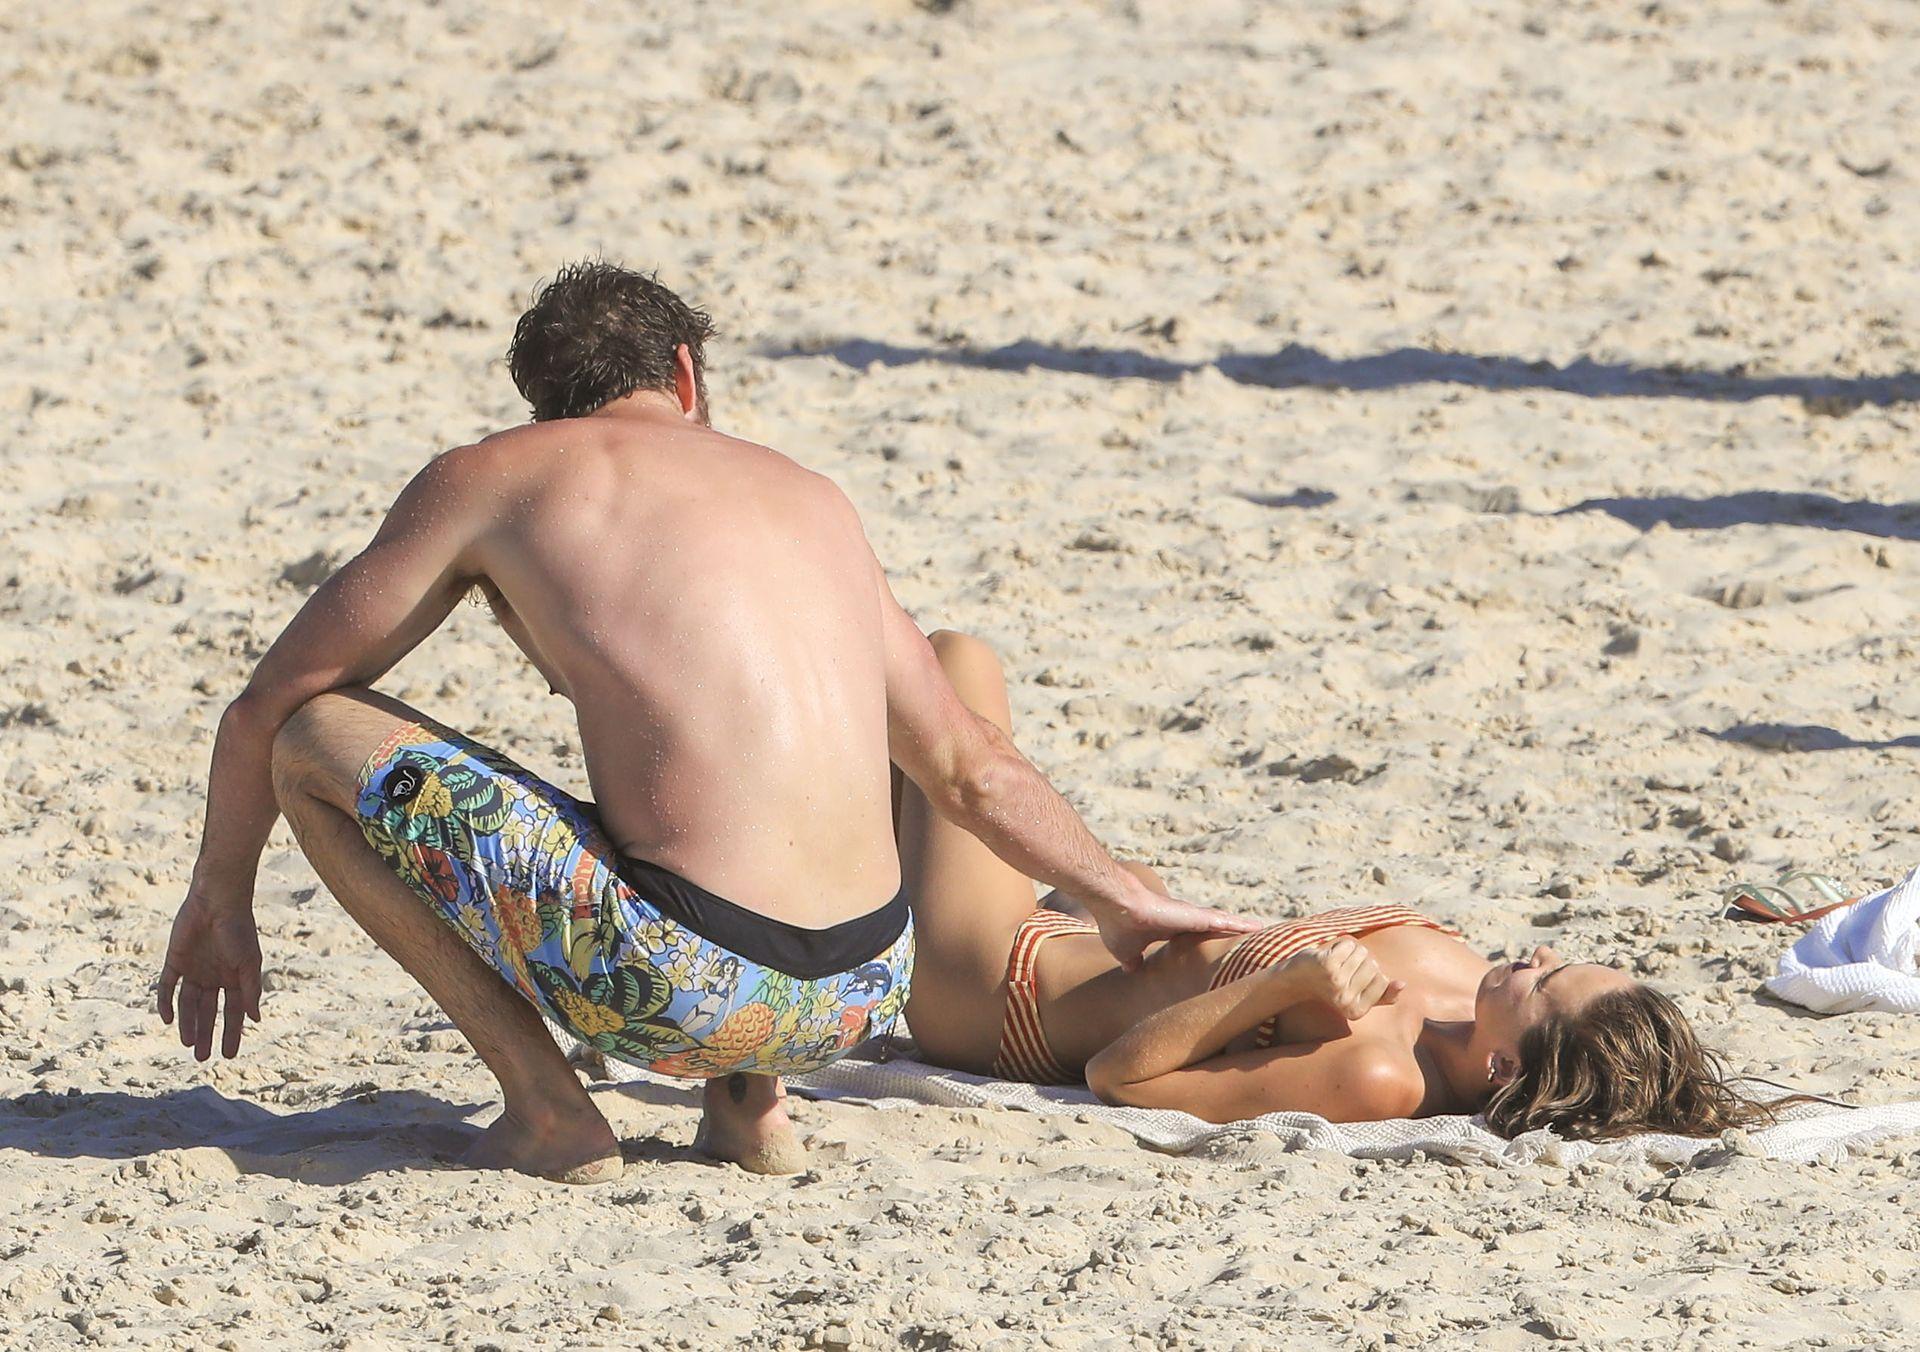 Gabriella Brooks Hot – Liam Hemsworth's New Girlfriend 0028